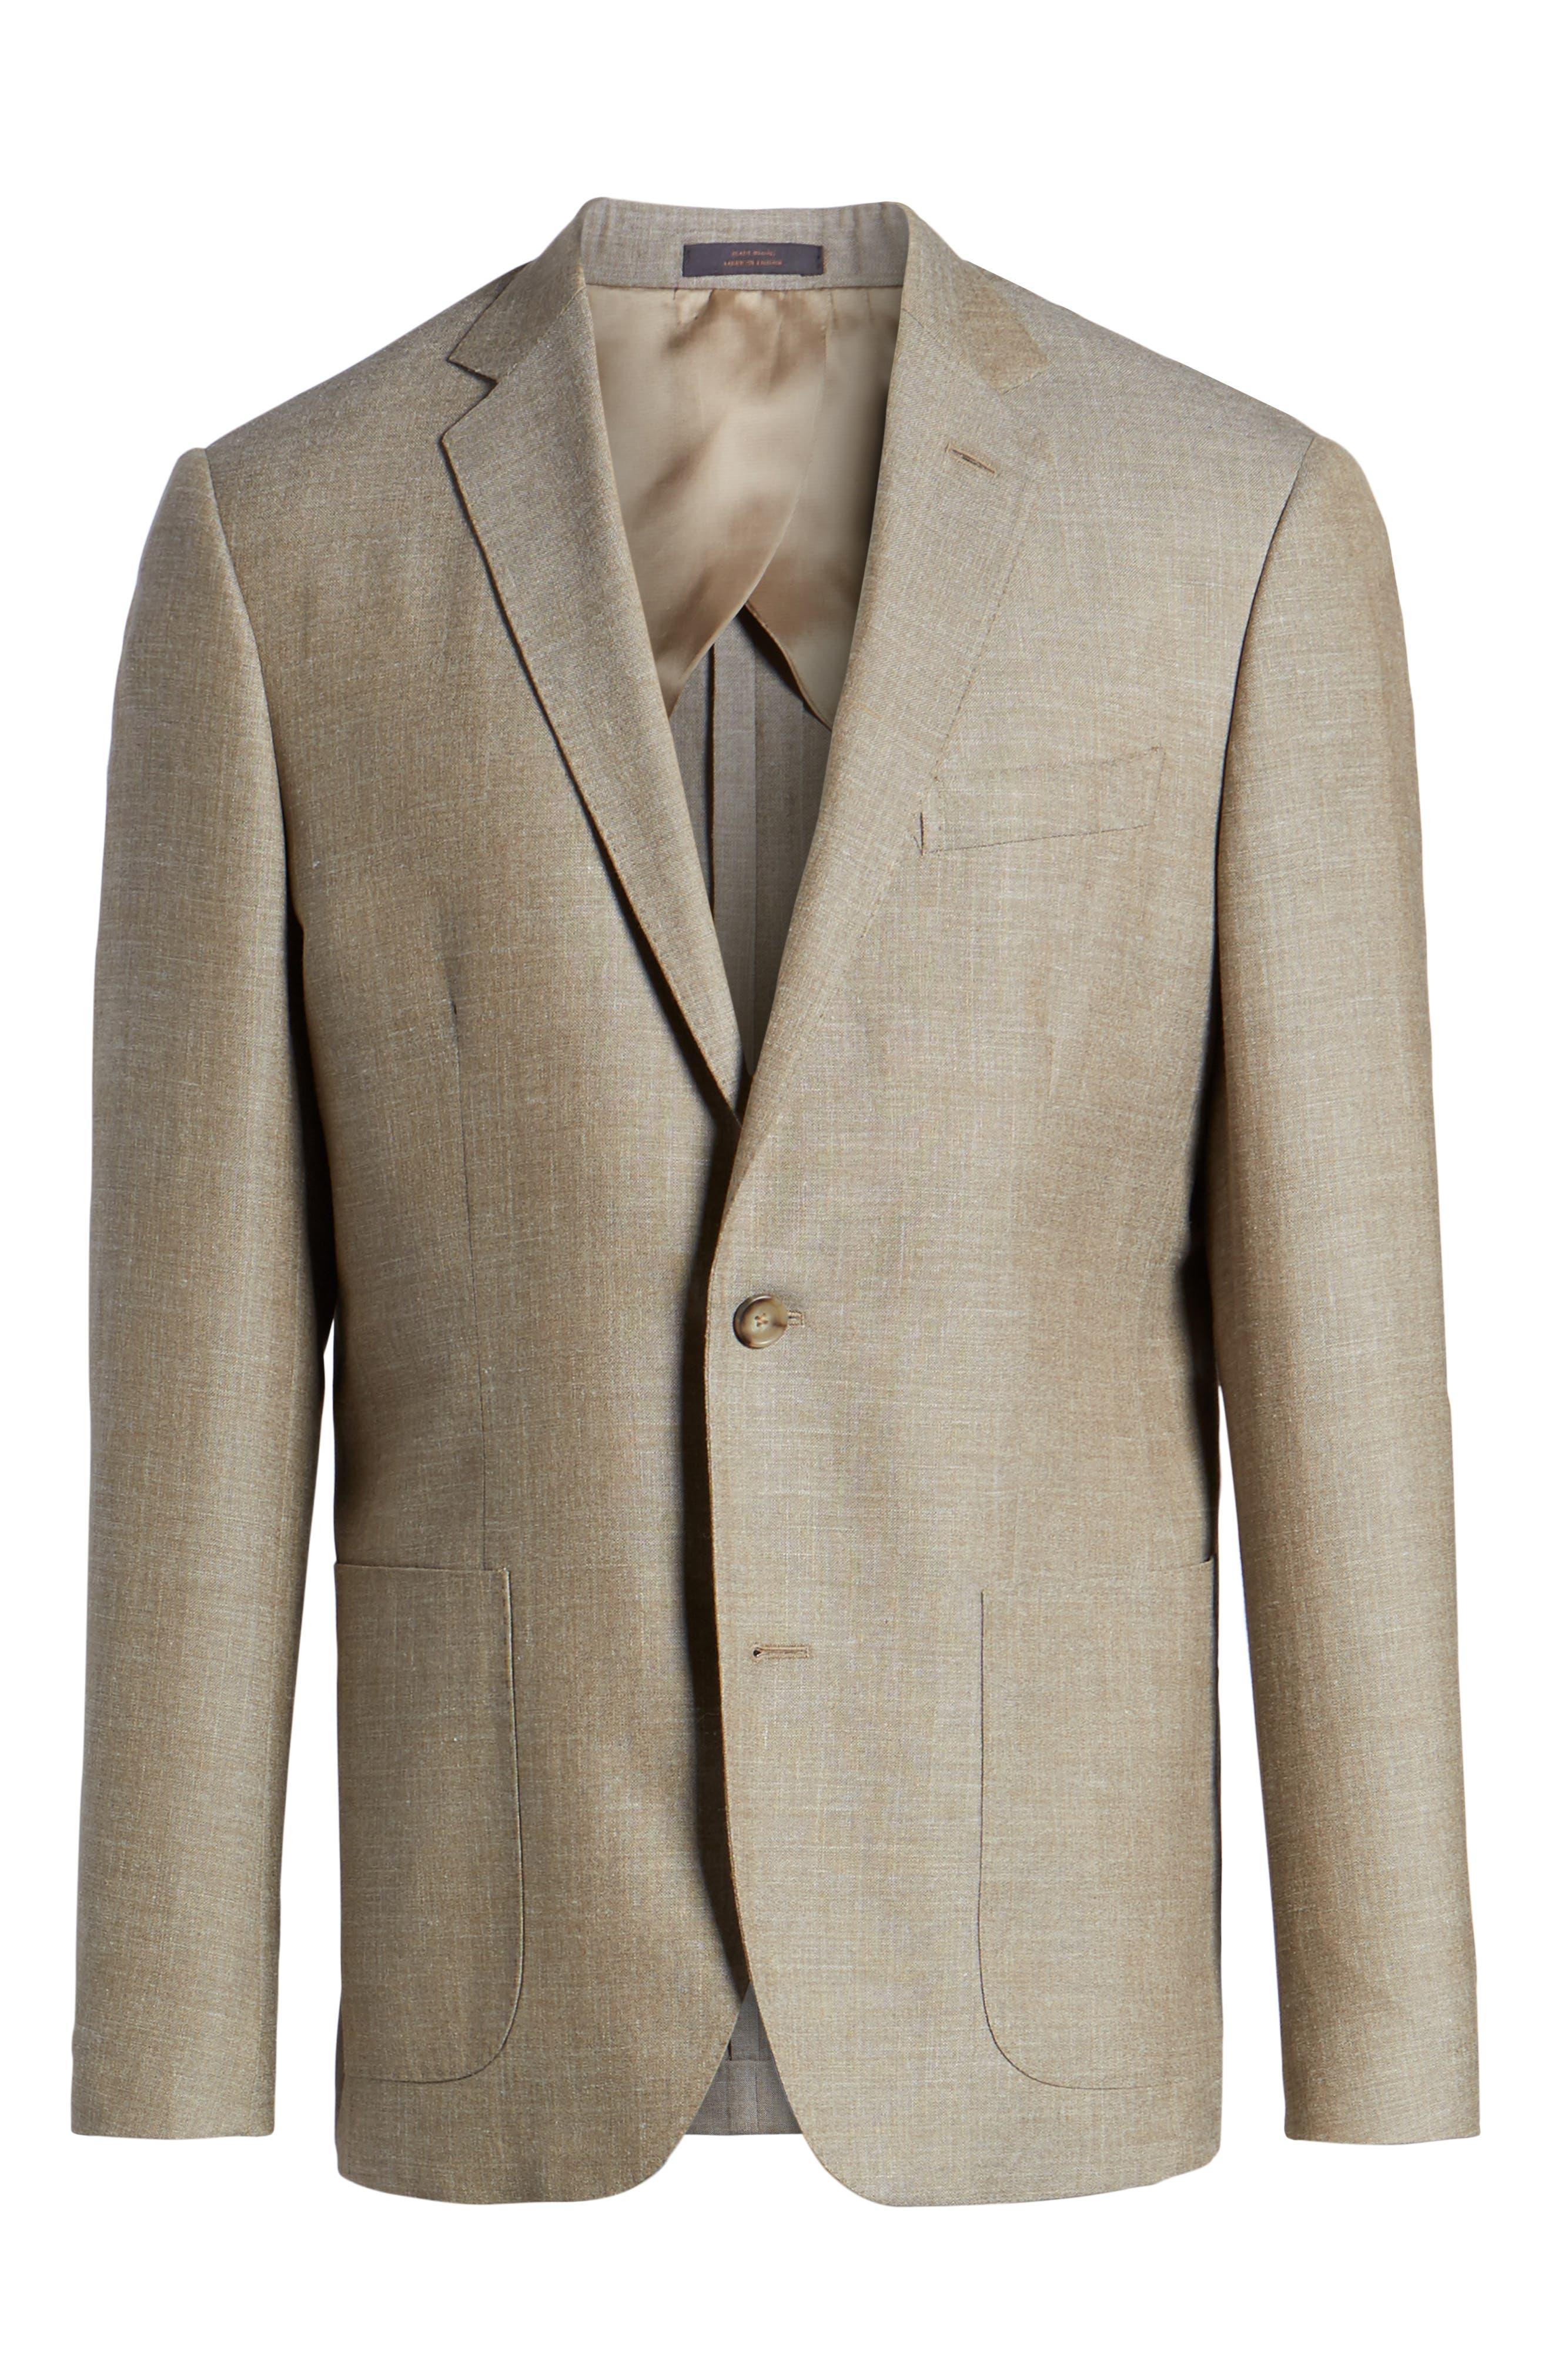 Trim Fit Wool Blend Blazer,                             Alternate thumbnail 6, color,                             Tan